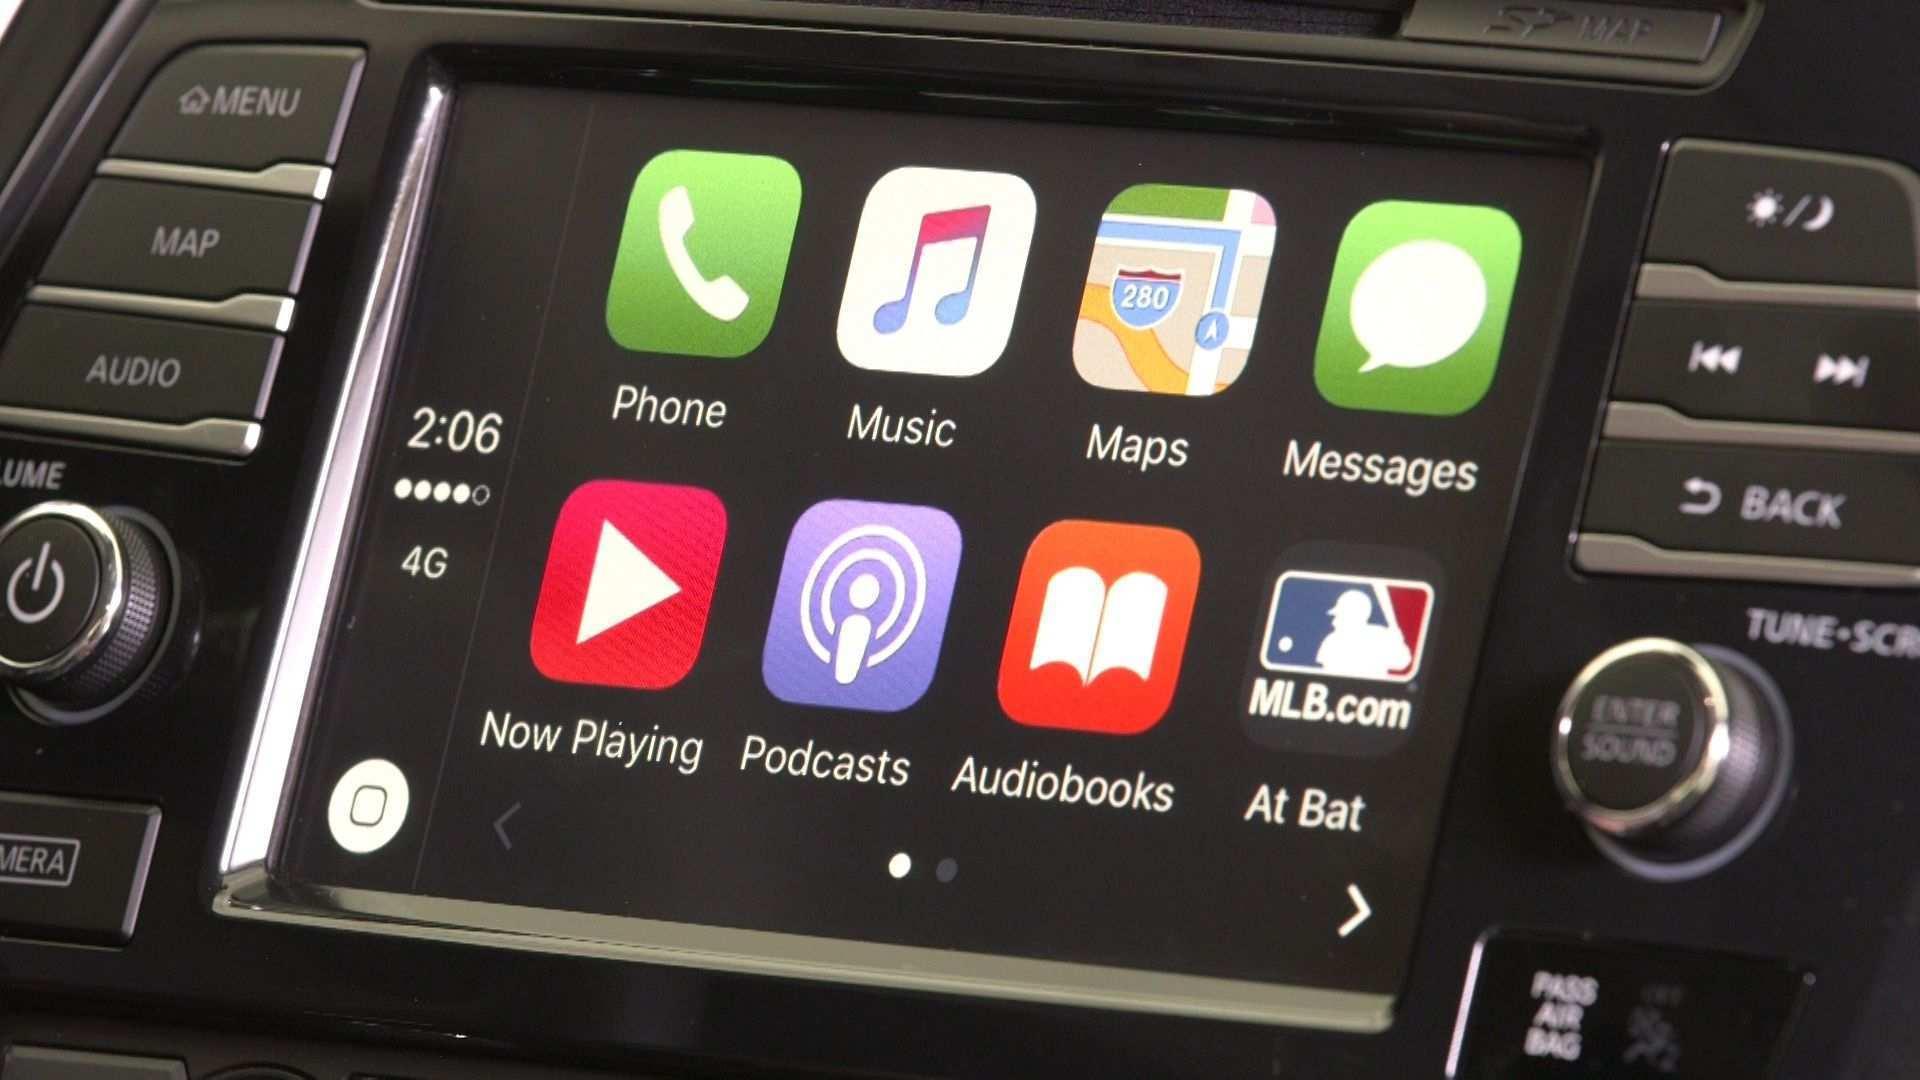 52 Concept of Mazda 2020 Apple Carplay Research New for Mazda 2020 Apple Carplay